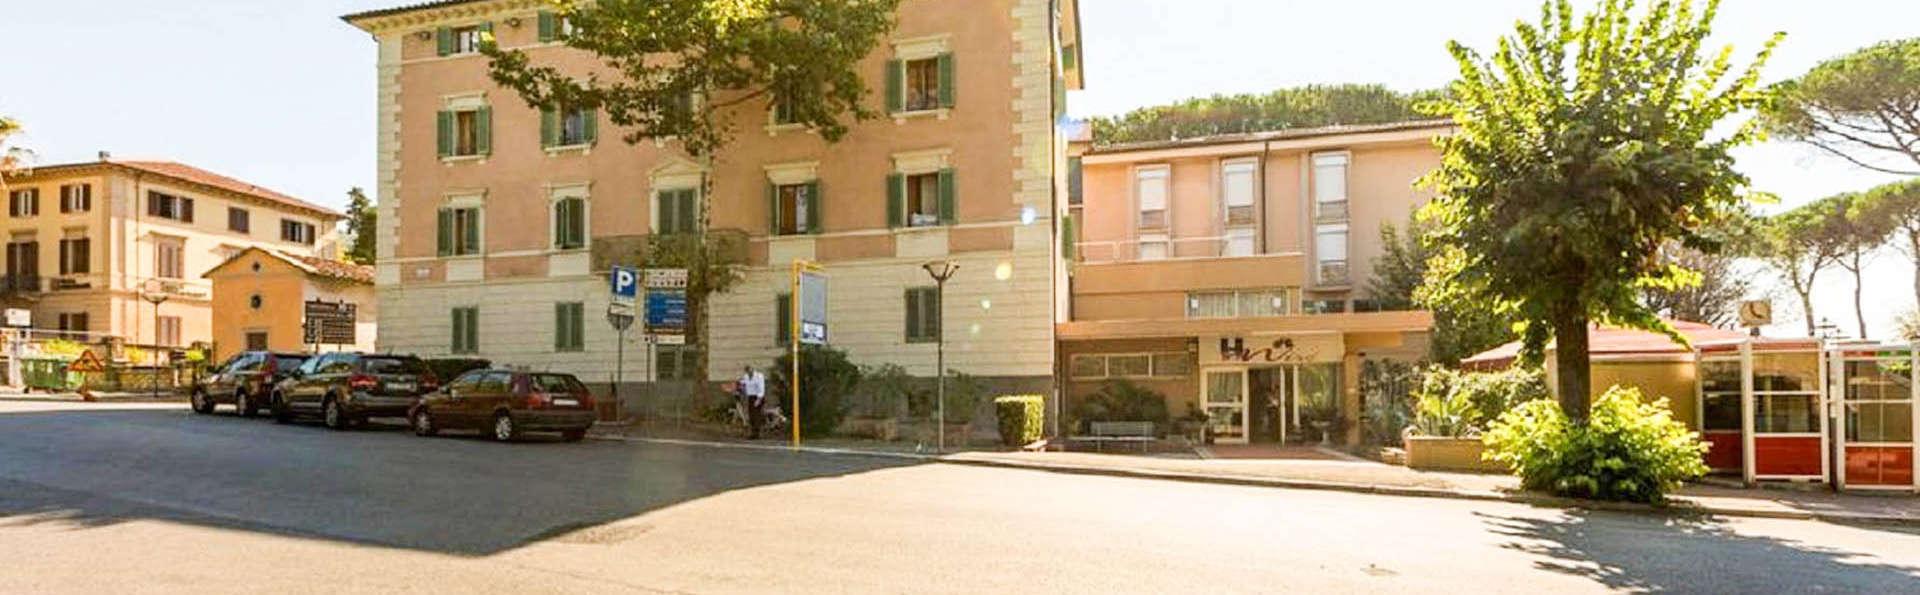 Hotel Mirò - EDIT_EXTERIOR_01.jpg